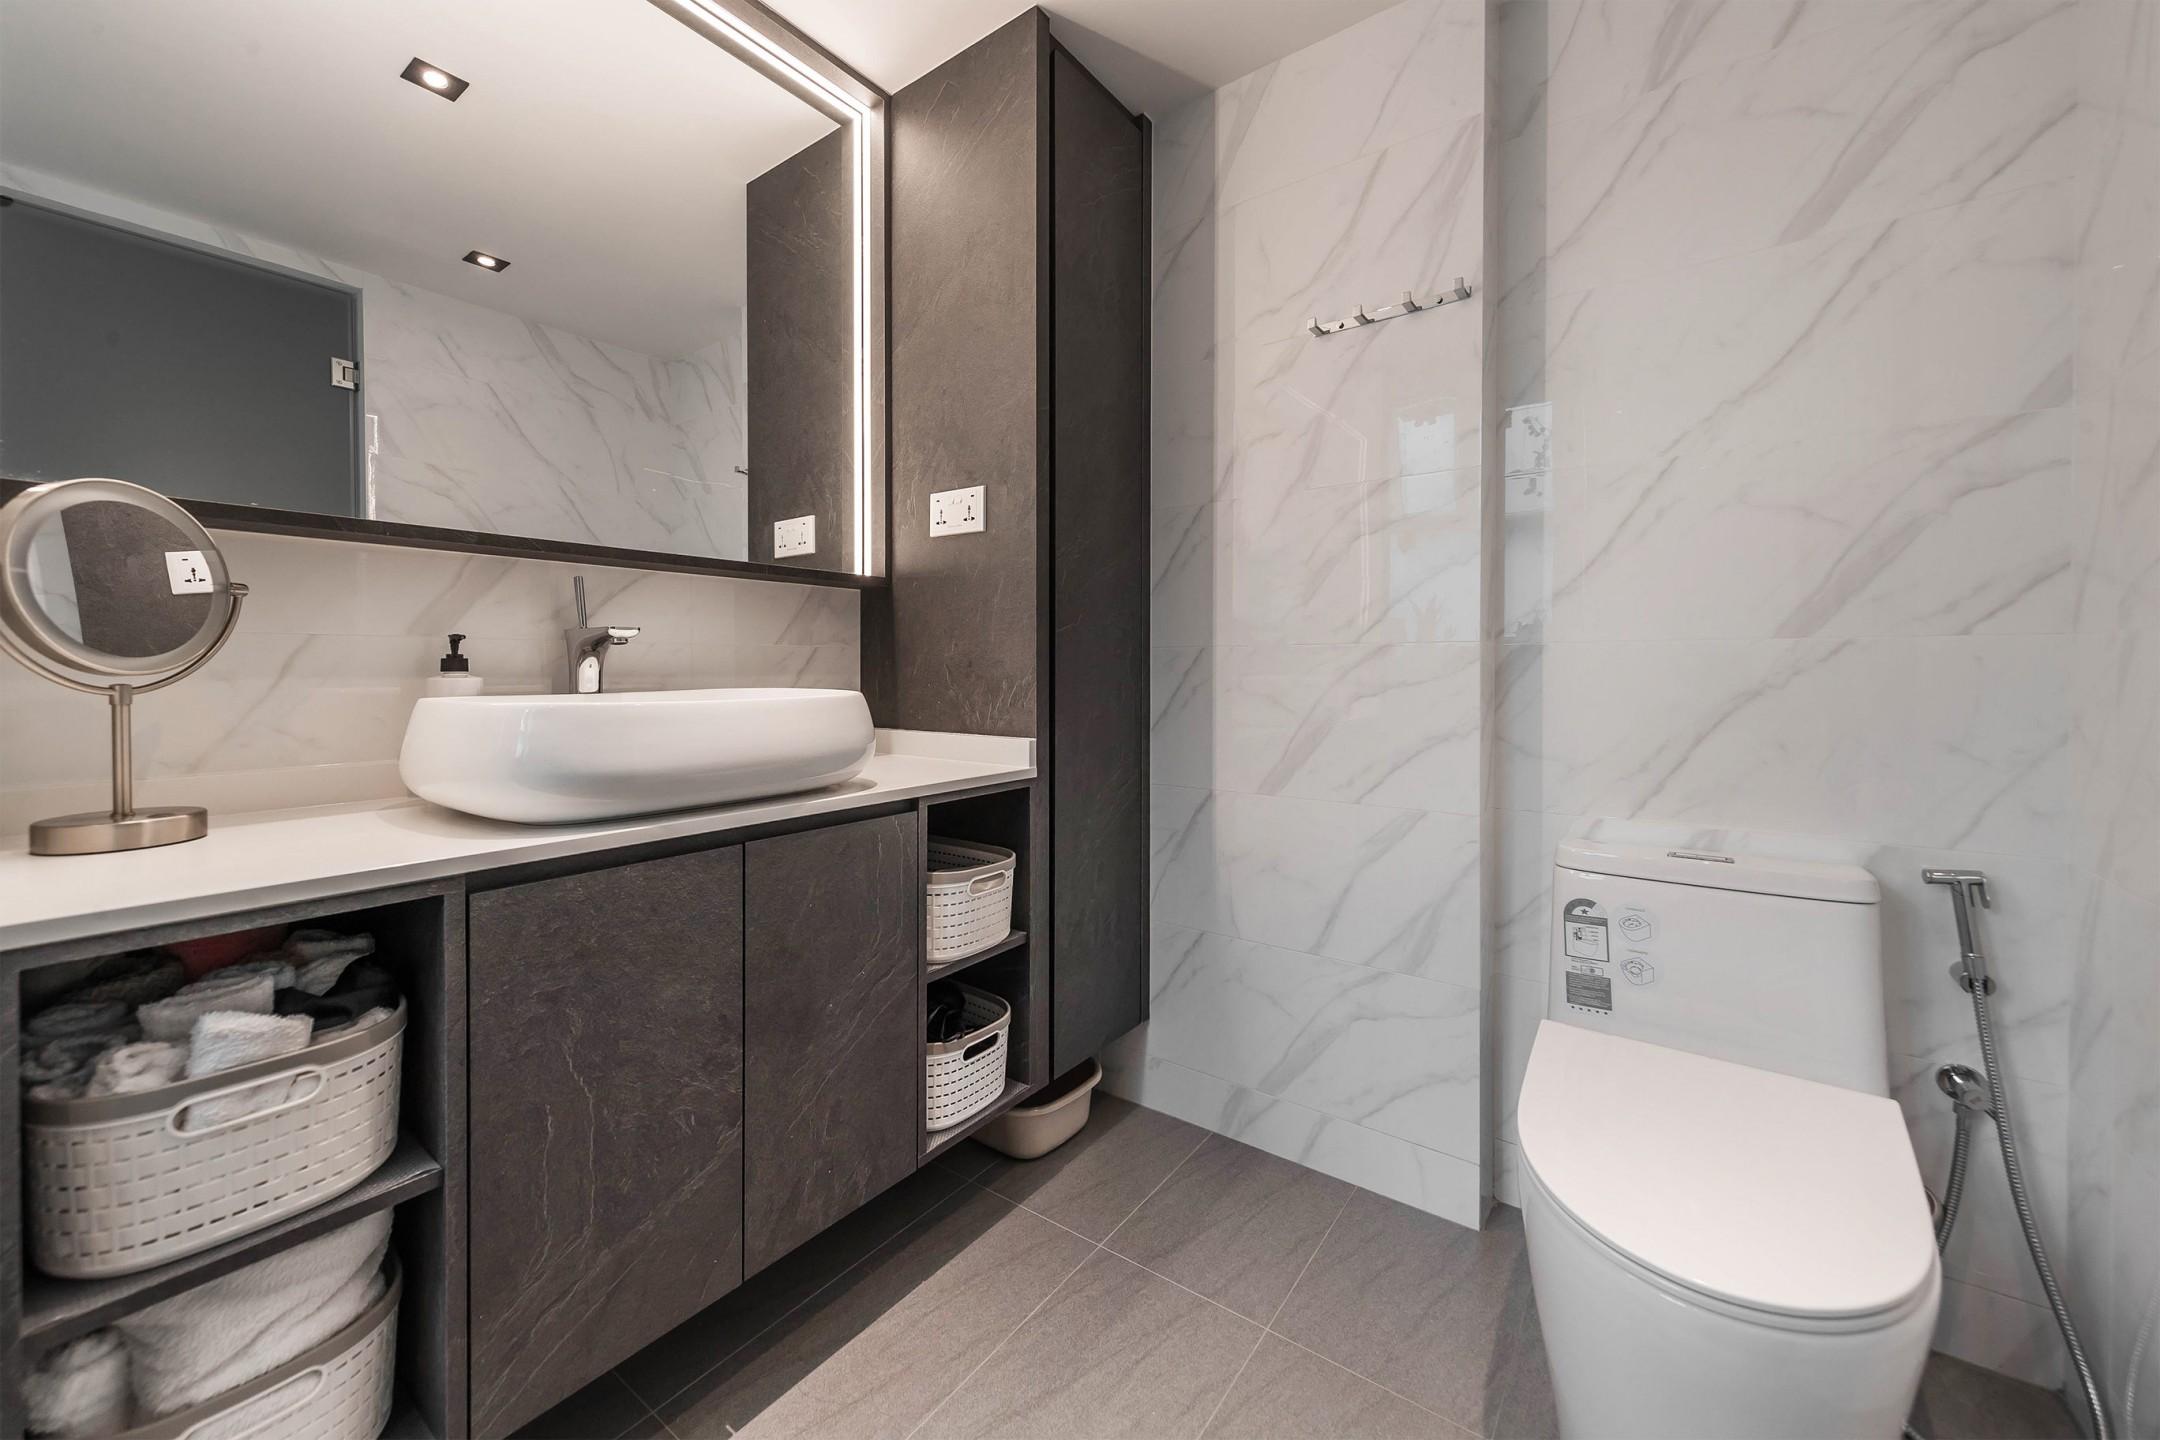 squarerooms renozone condo condominium renovation home interior design bathroom toilet monochromatic grey white